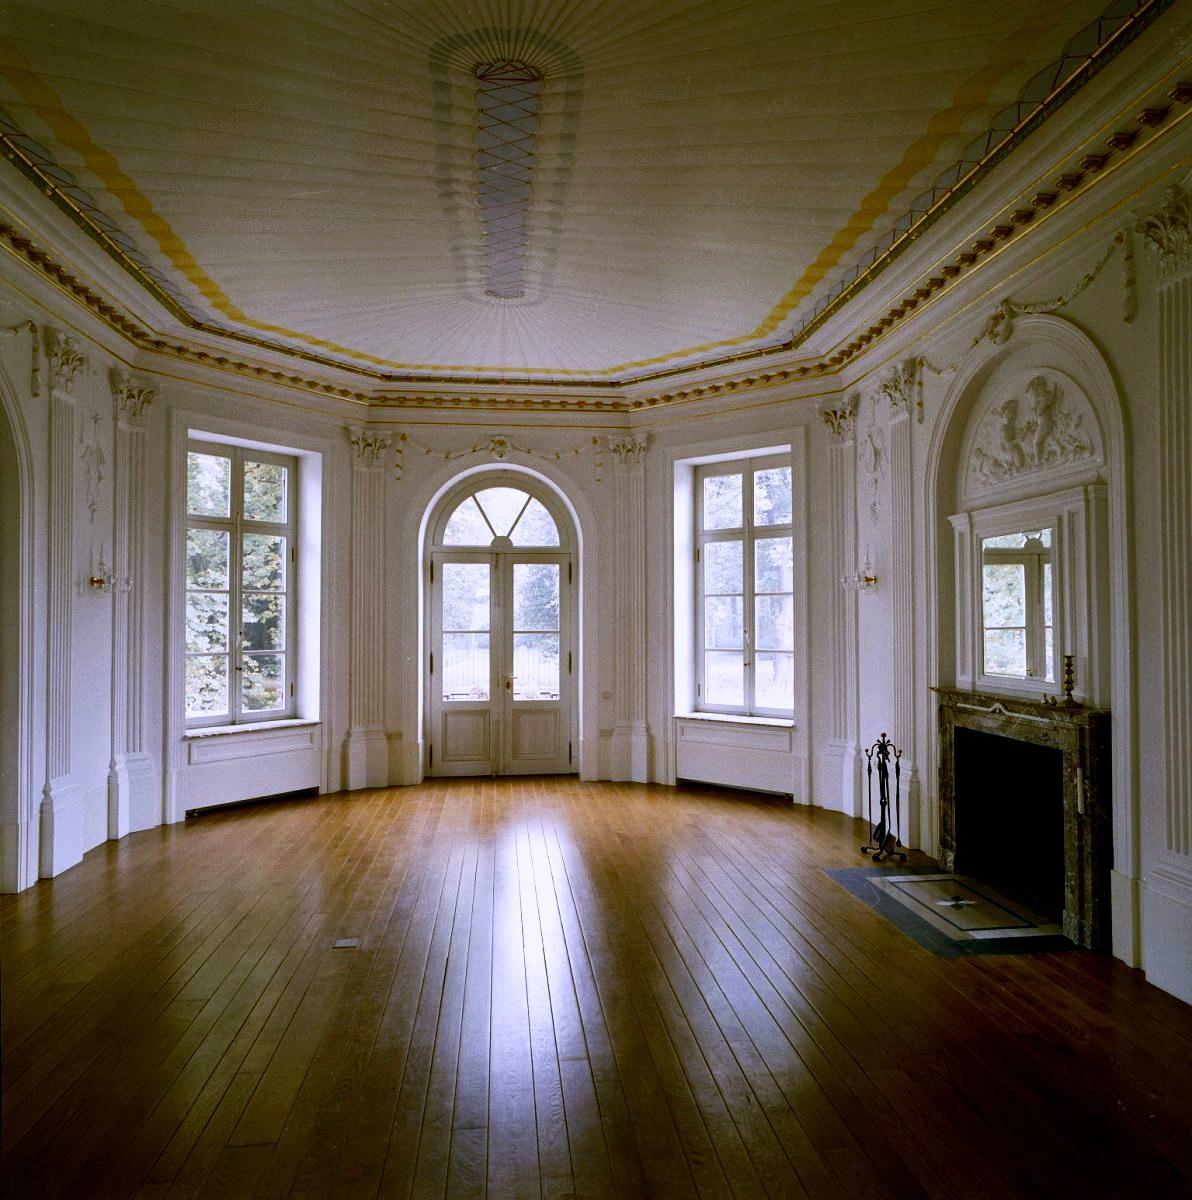 File interieur salon schouw obbicht 20276110 rce for Interieur wikipedia